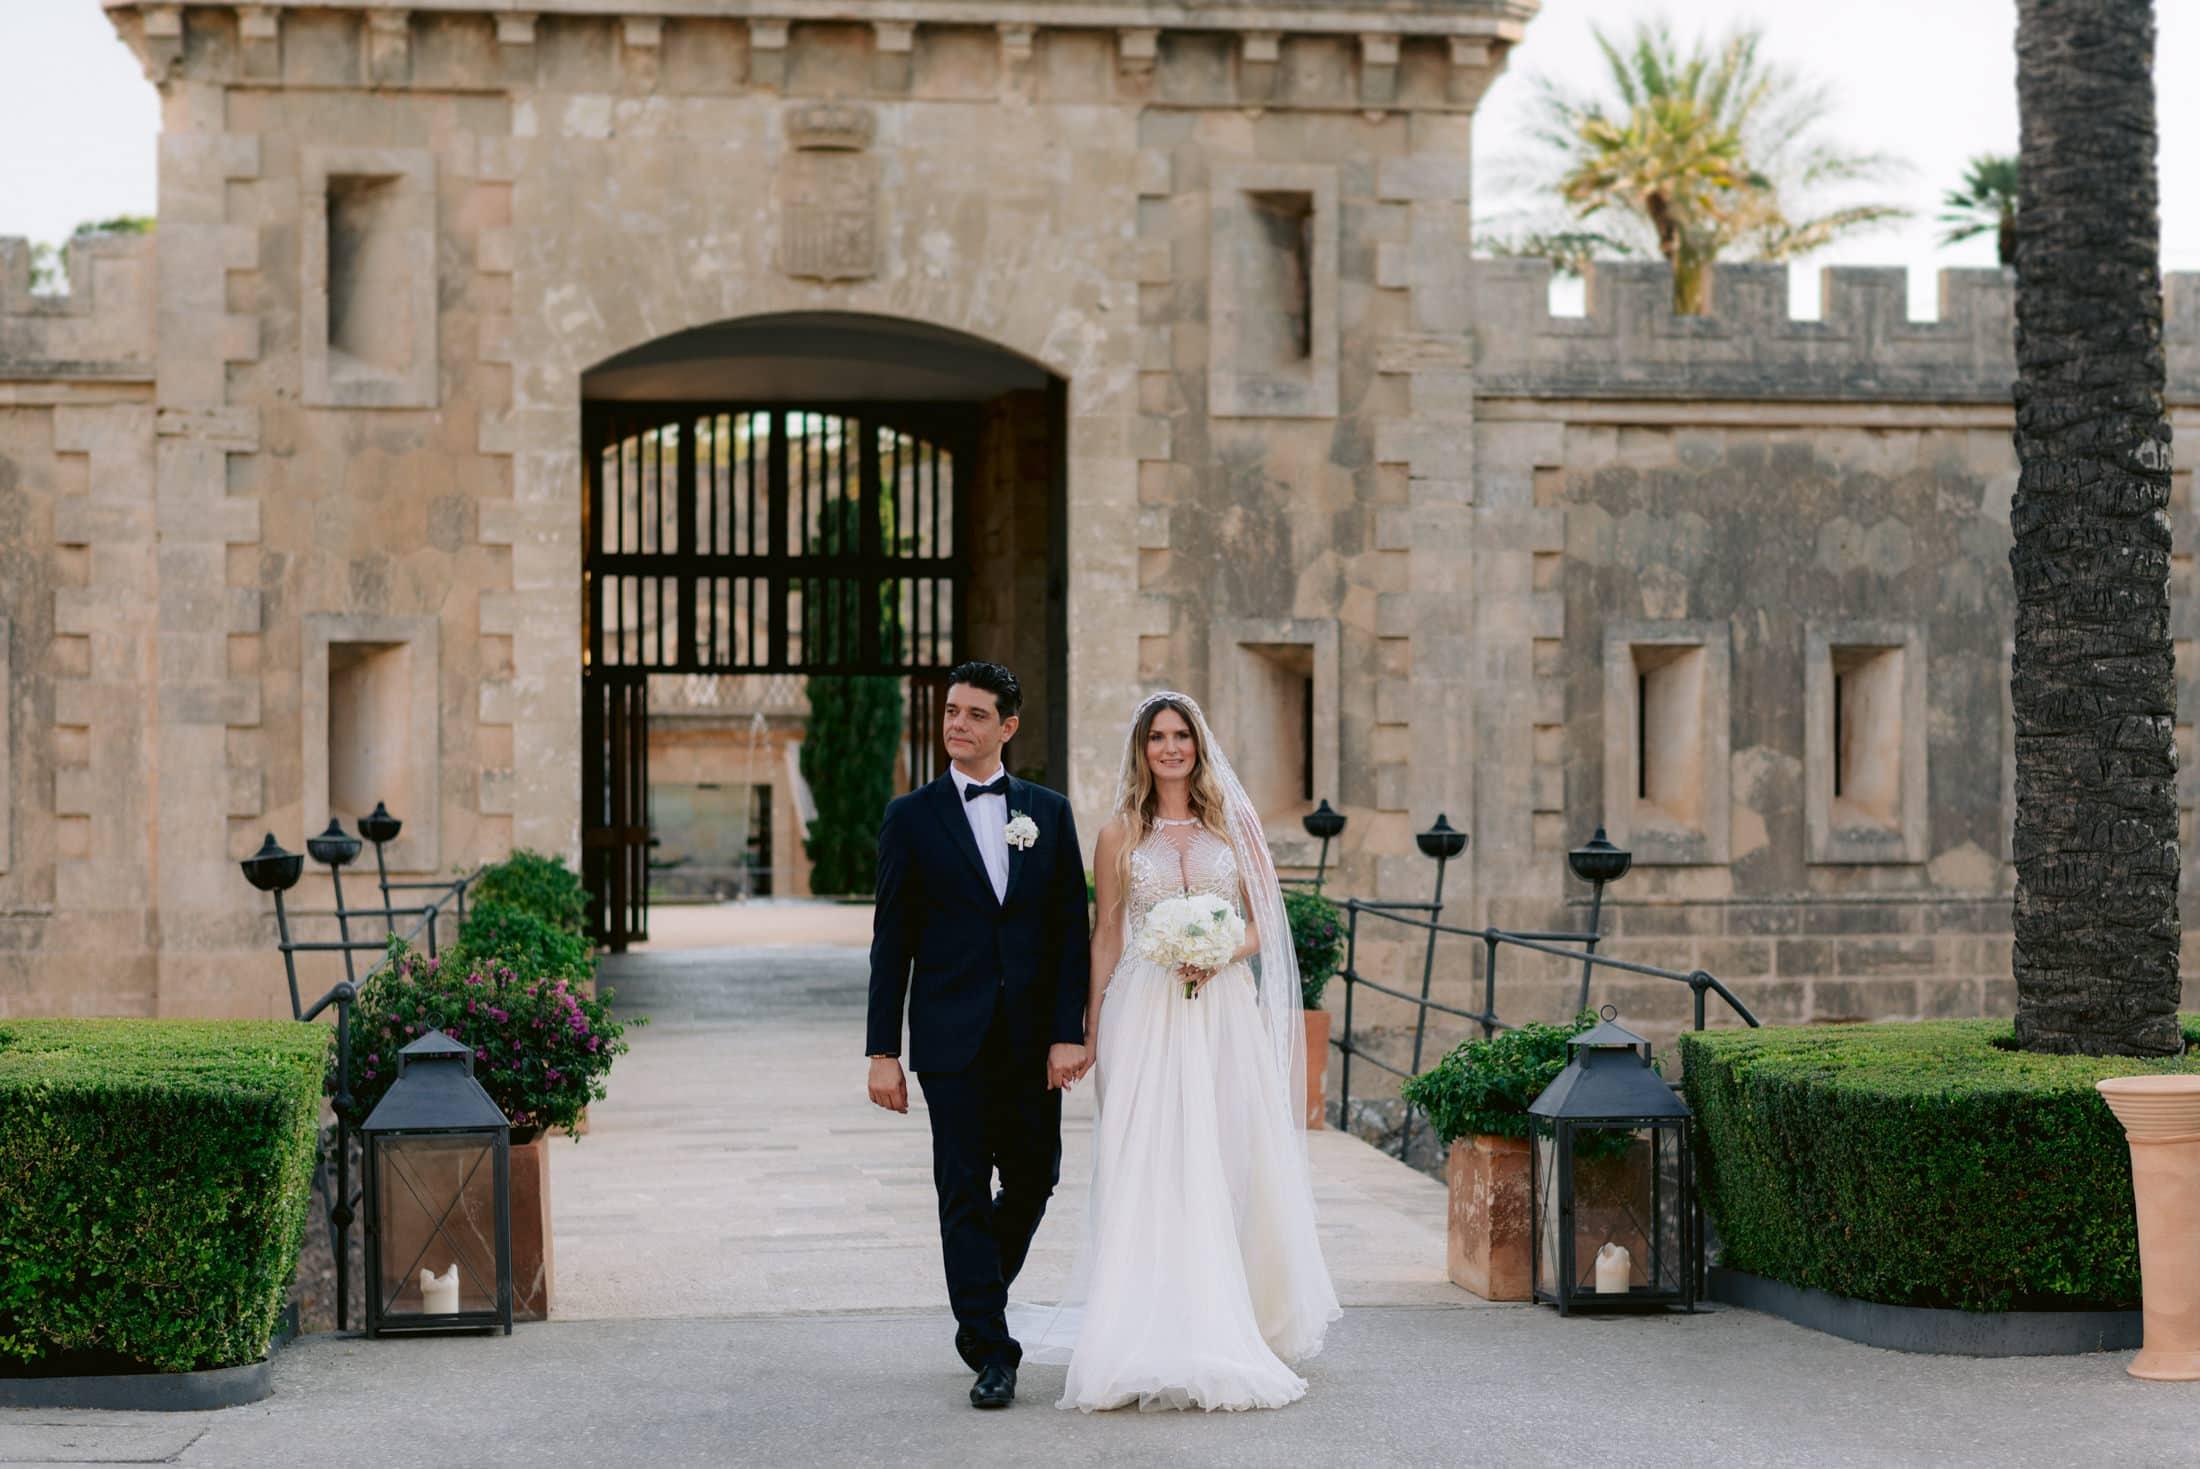 Elopement Wedding at Cap Rocat in Mallorca Spain